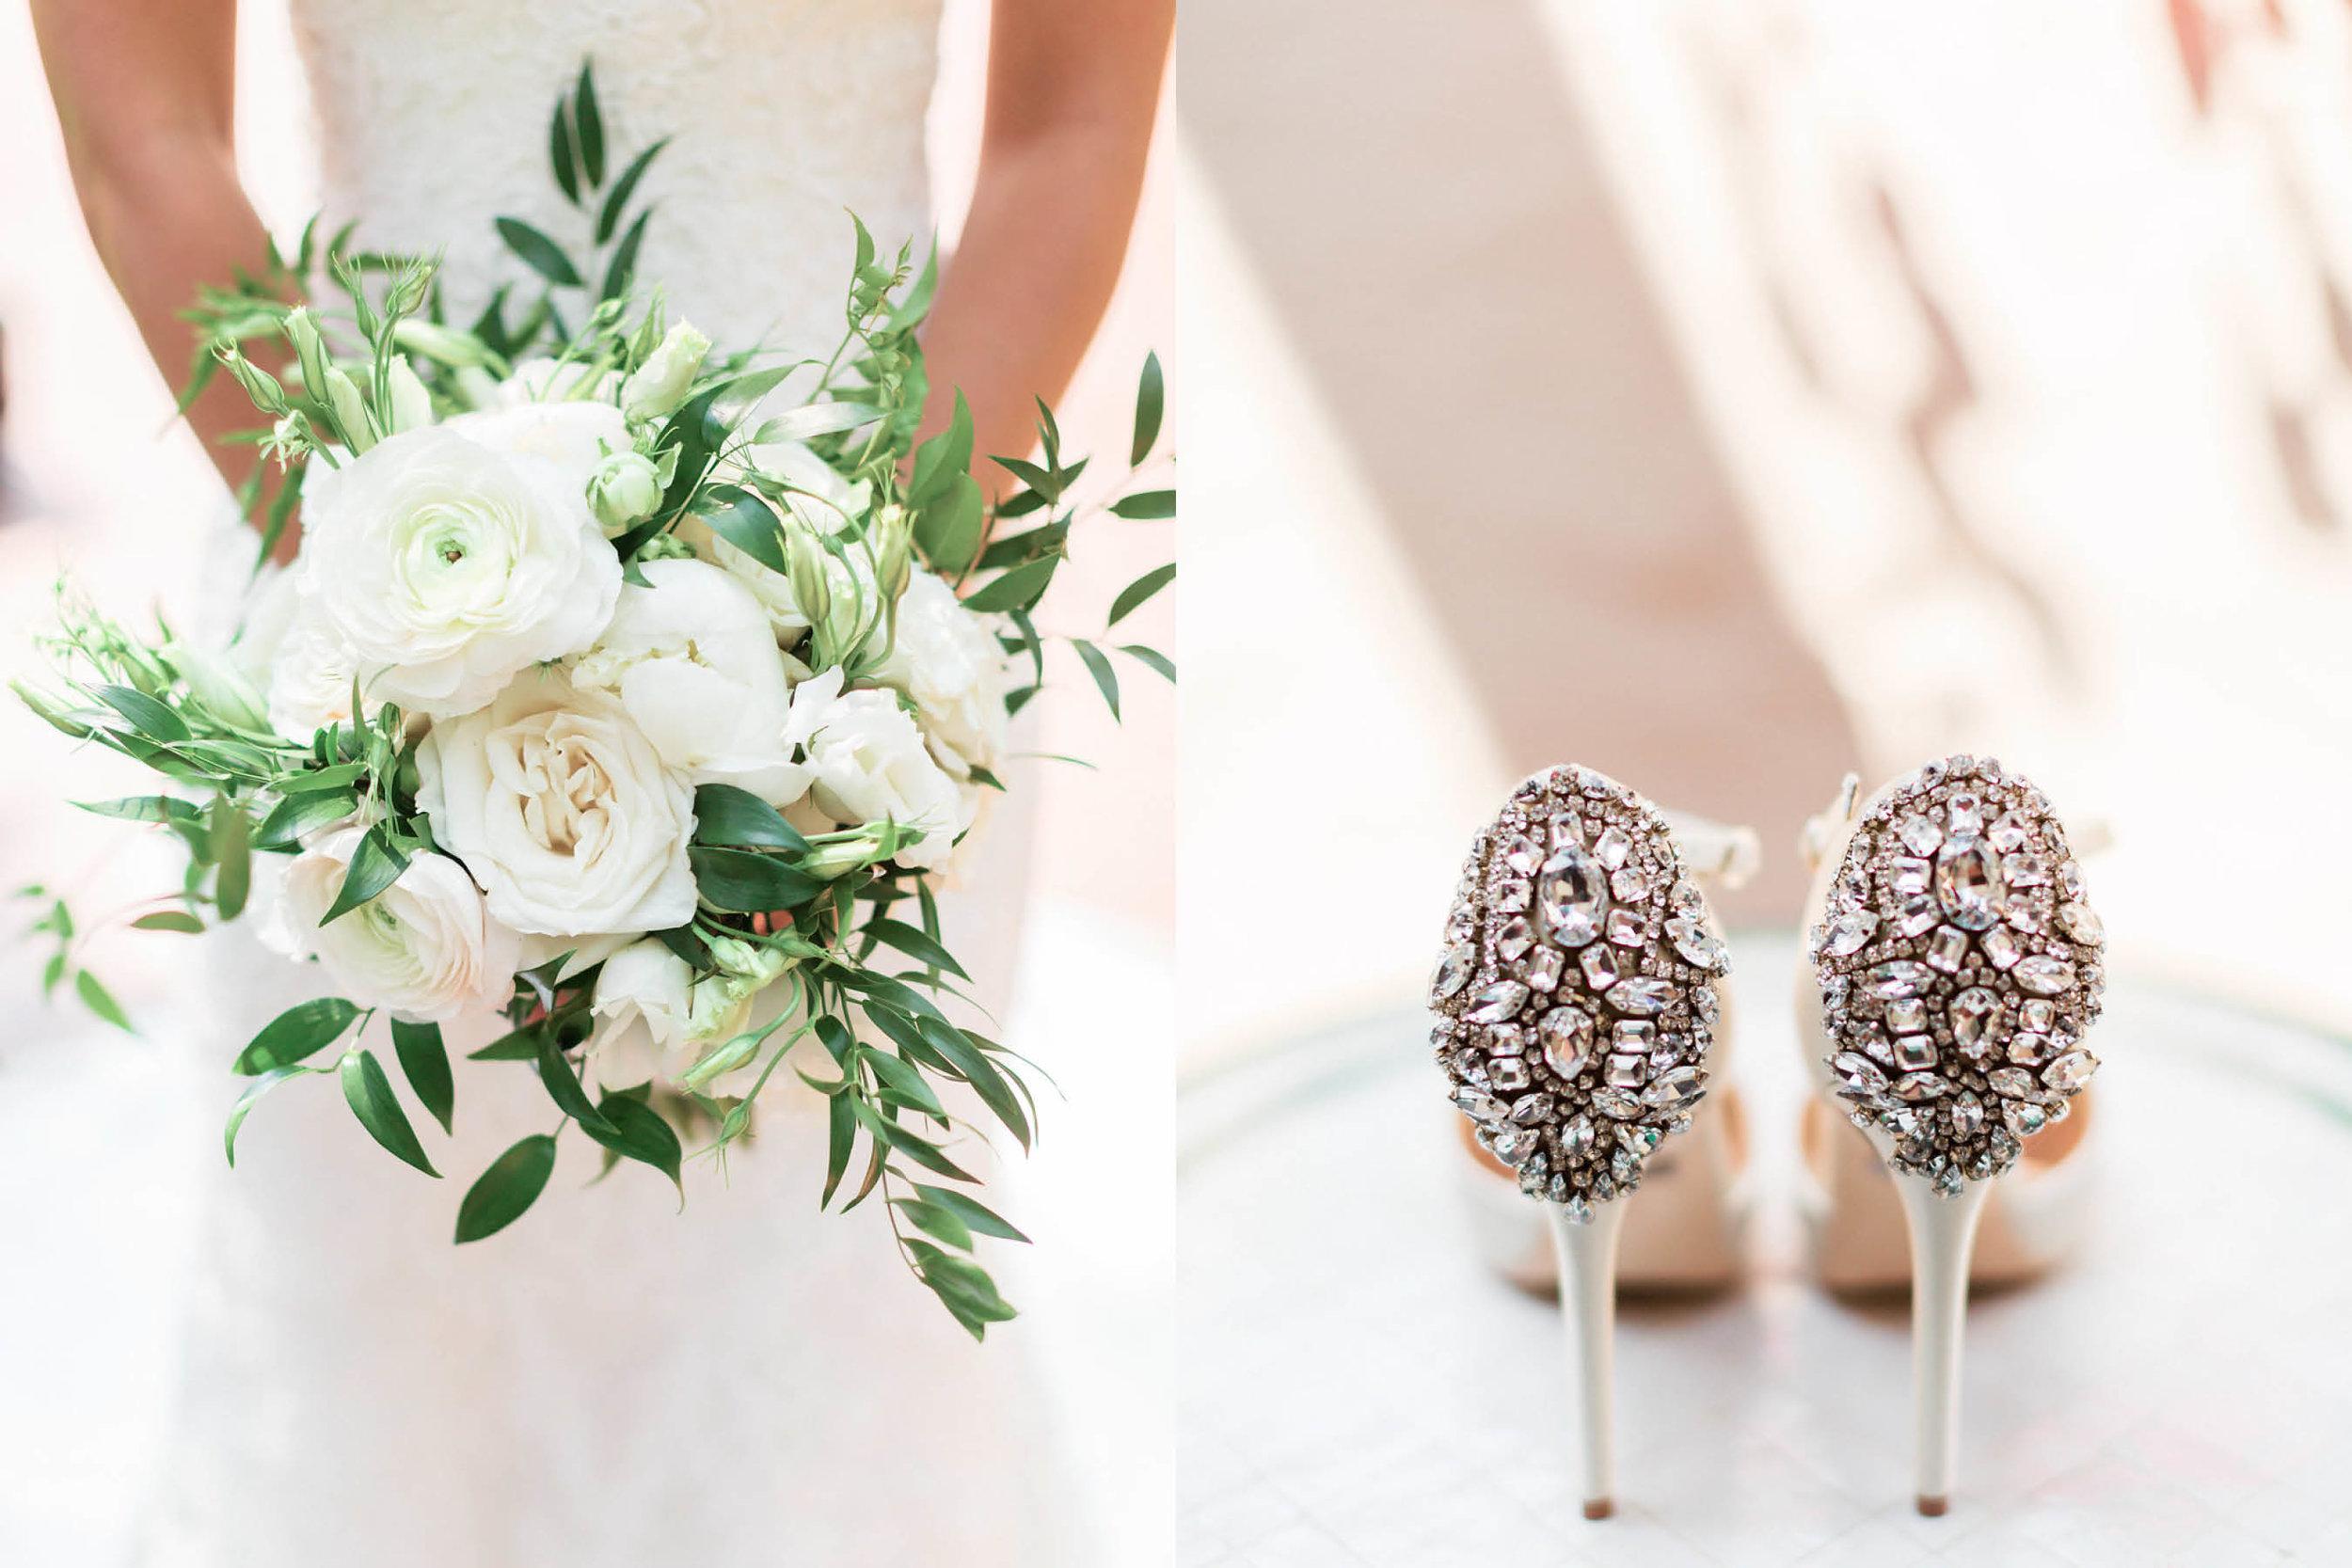 santa-barbara-elopement-elope-wedding-planner-coordinator-day-of-four-seasons-biltmore-ocean-front-view-garden-pink-white-green-montecito-black-tie (6).jpg